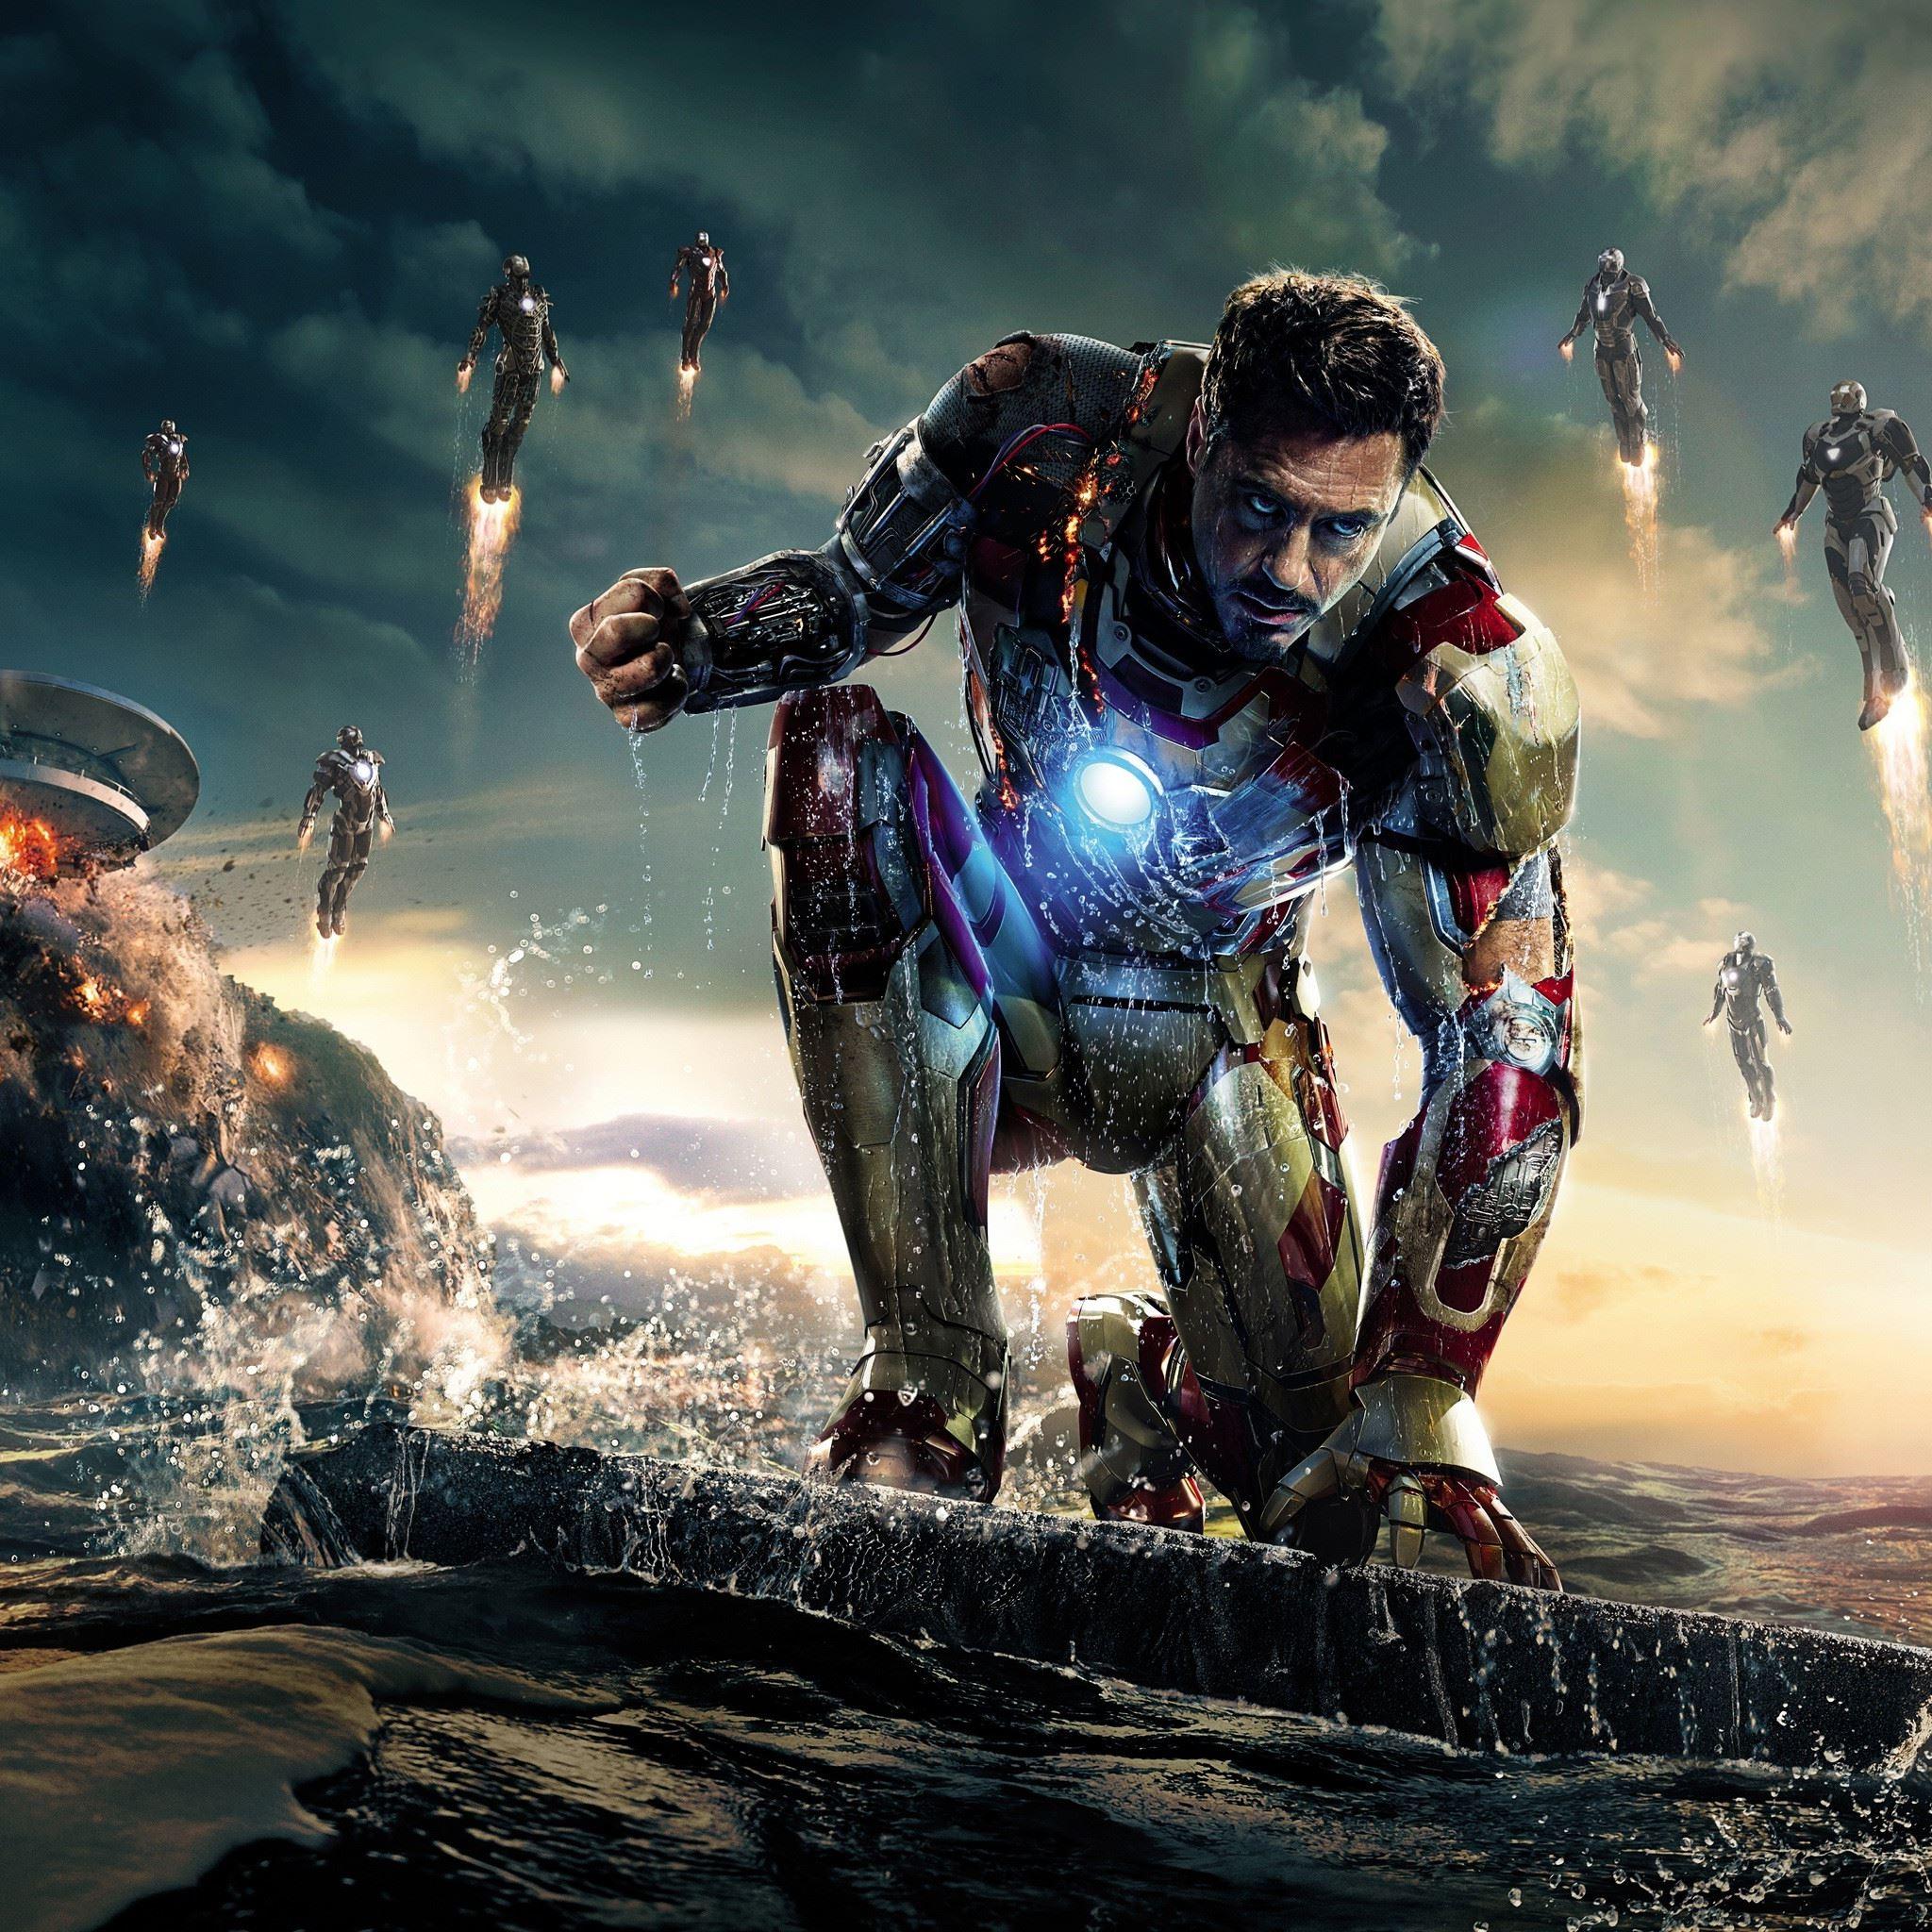 Iron Man 3 Hd Wallpapers Free Download